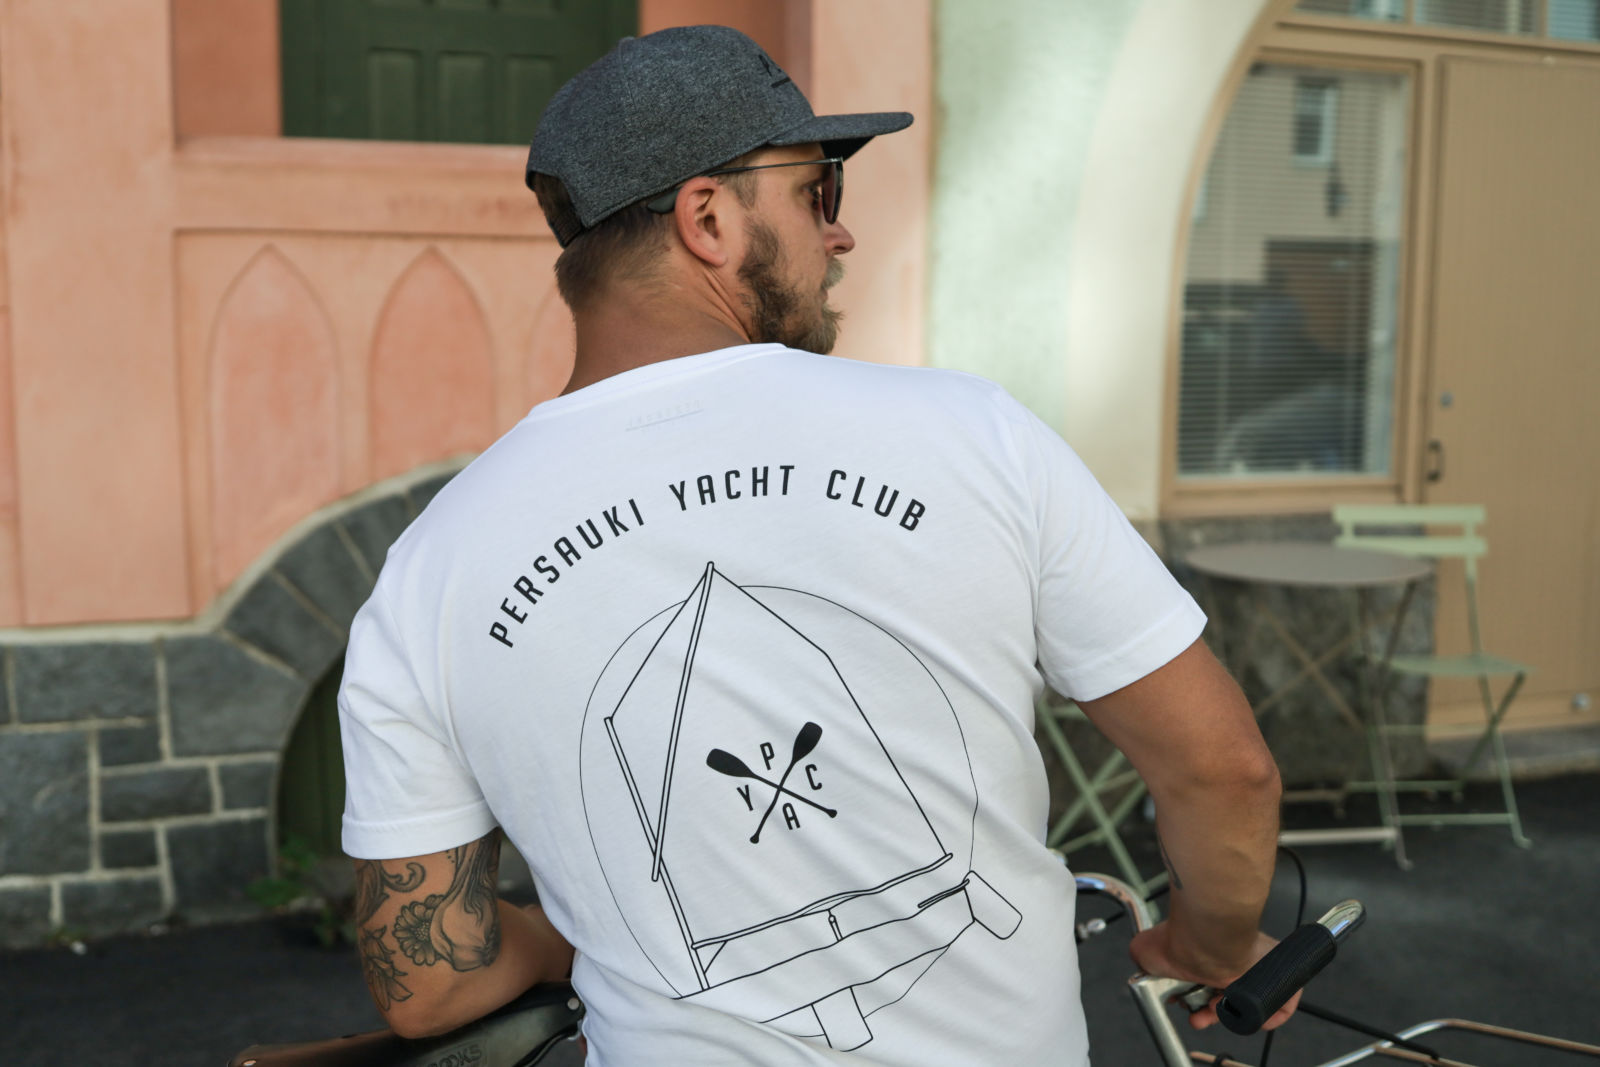 Tuotekuva: Persauki Yacht Club – Jollapaita